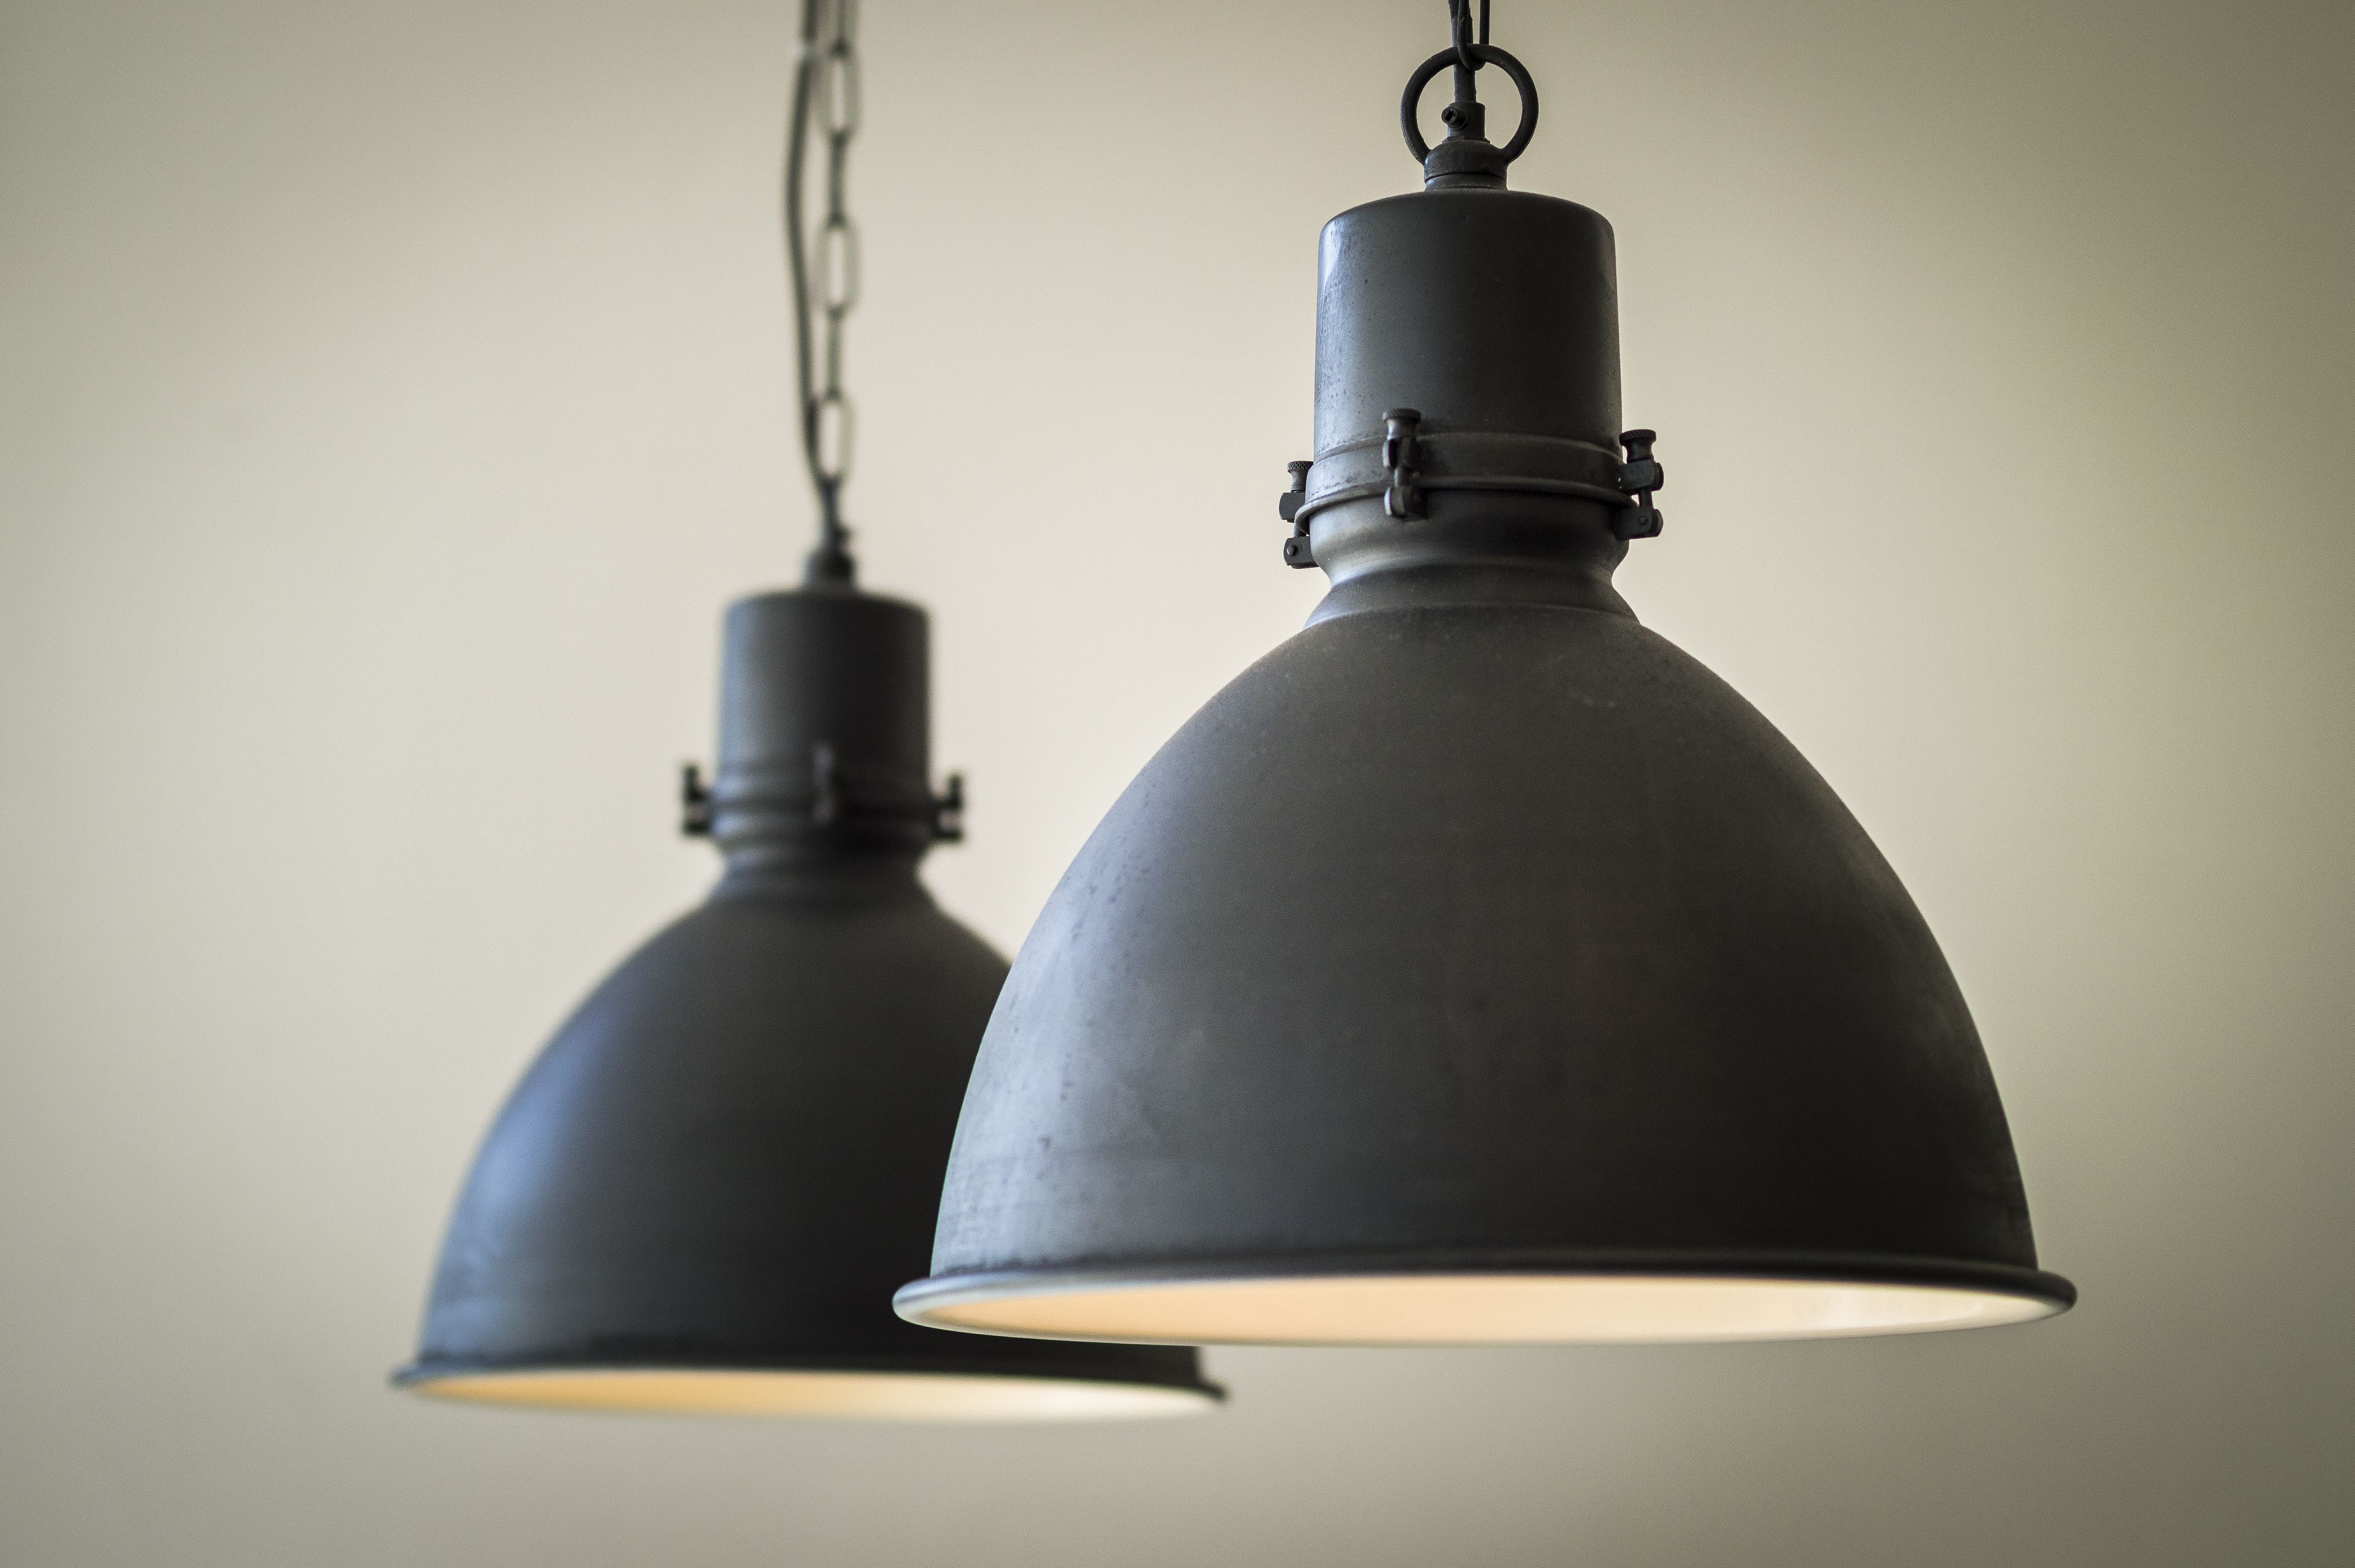 Stoere Keukens Keukenlamp : Fabriekslamp zwart unieke zwarte hanglamp of keukenlamp